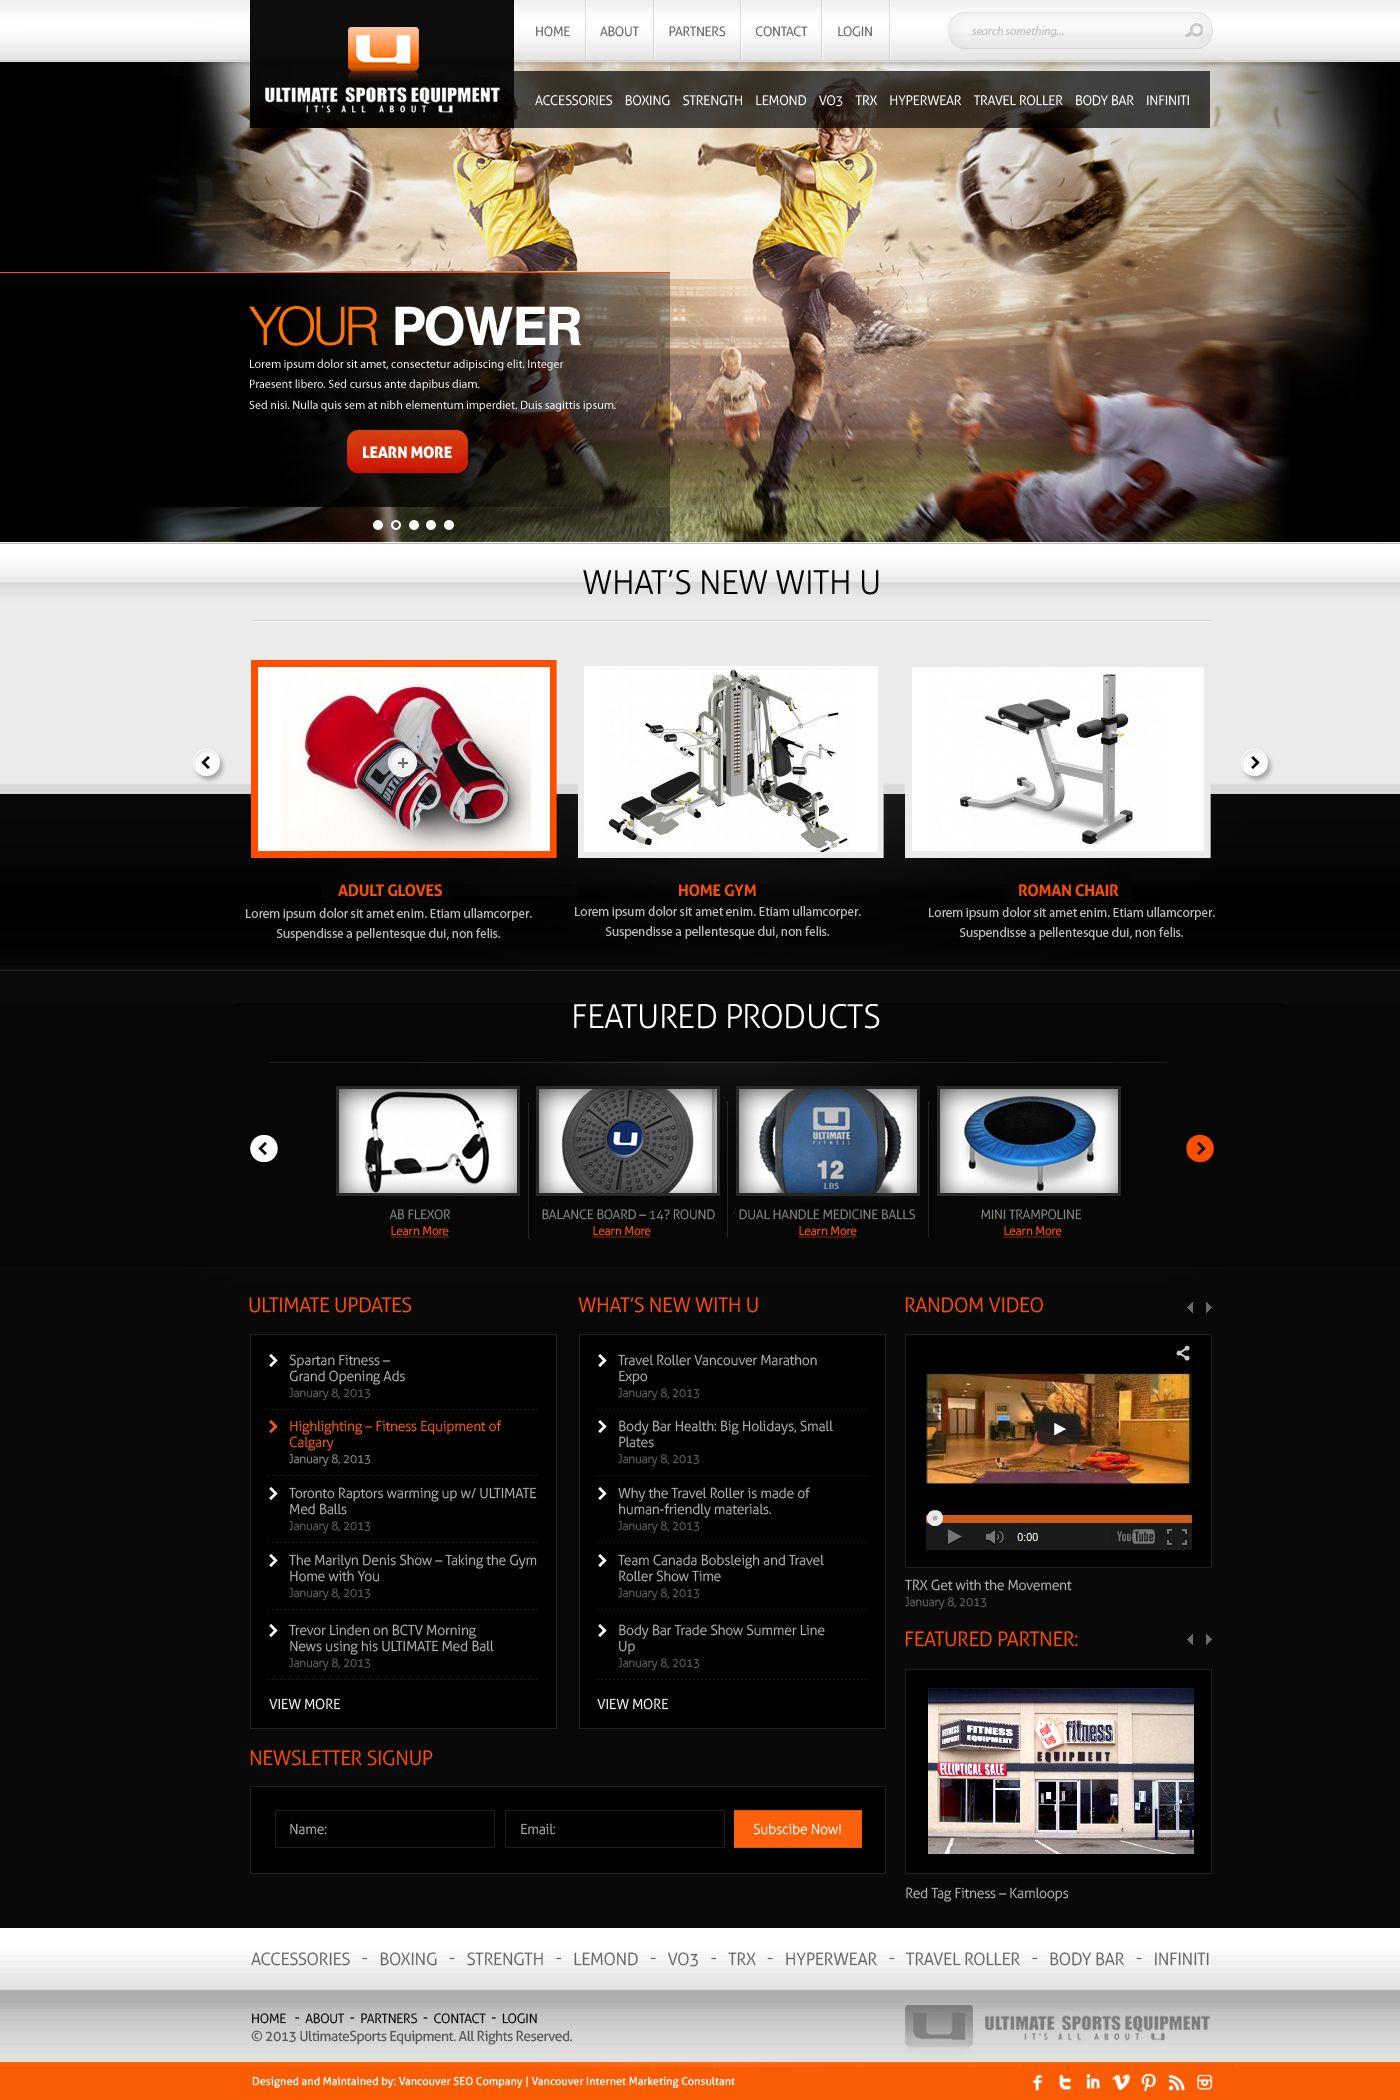 Web Design Company Middlesbrough